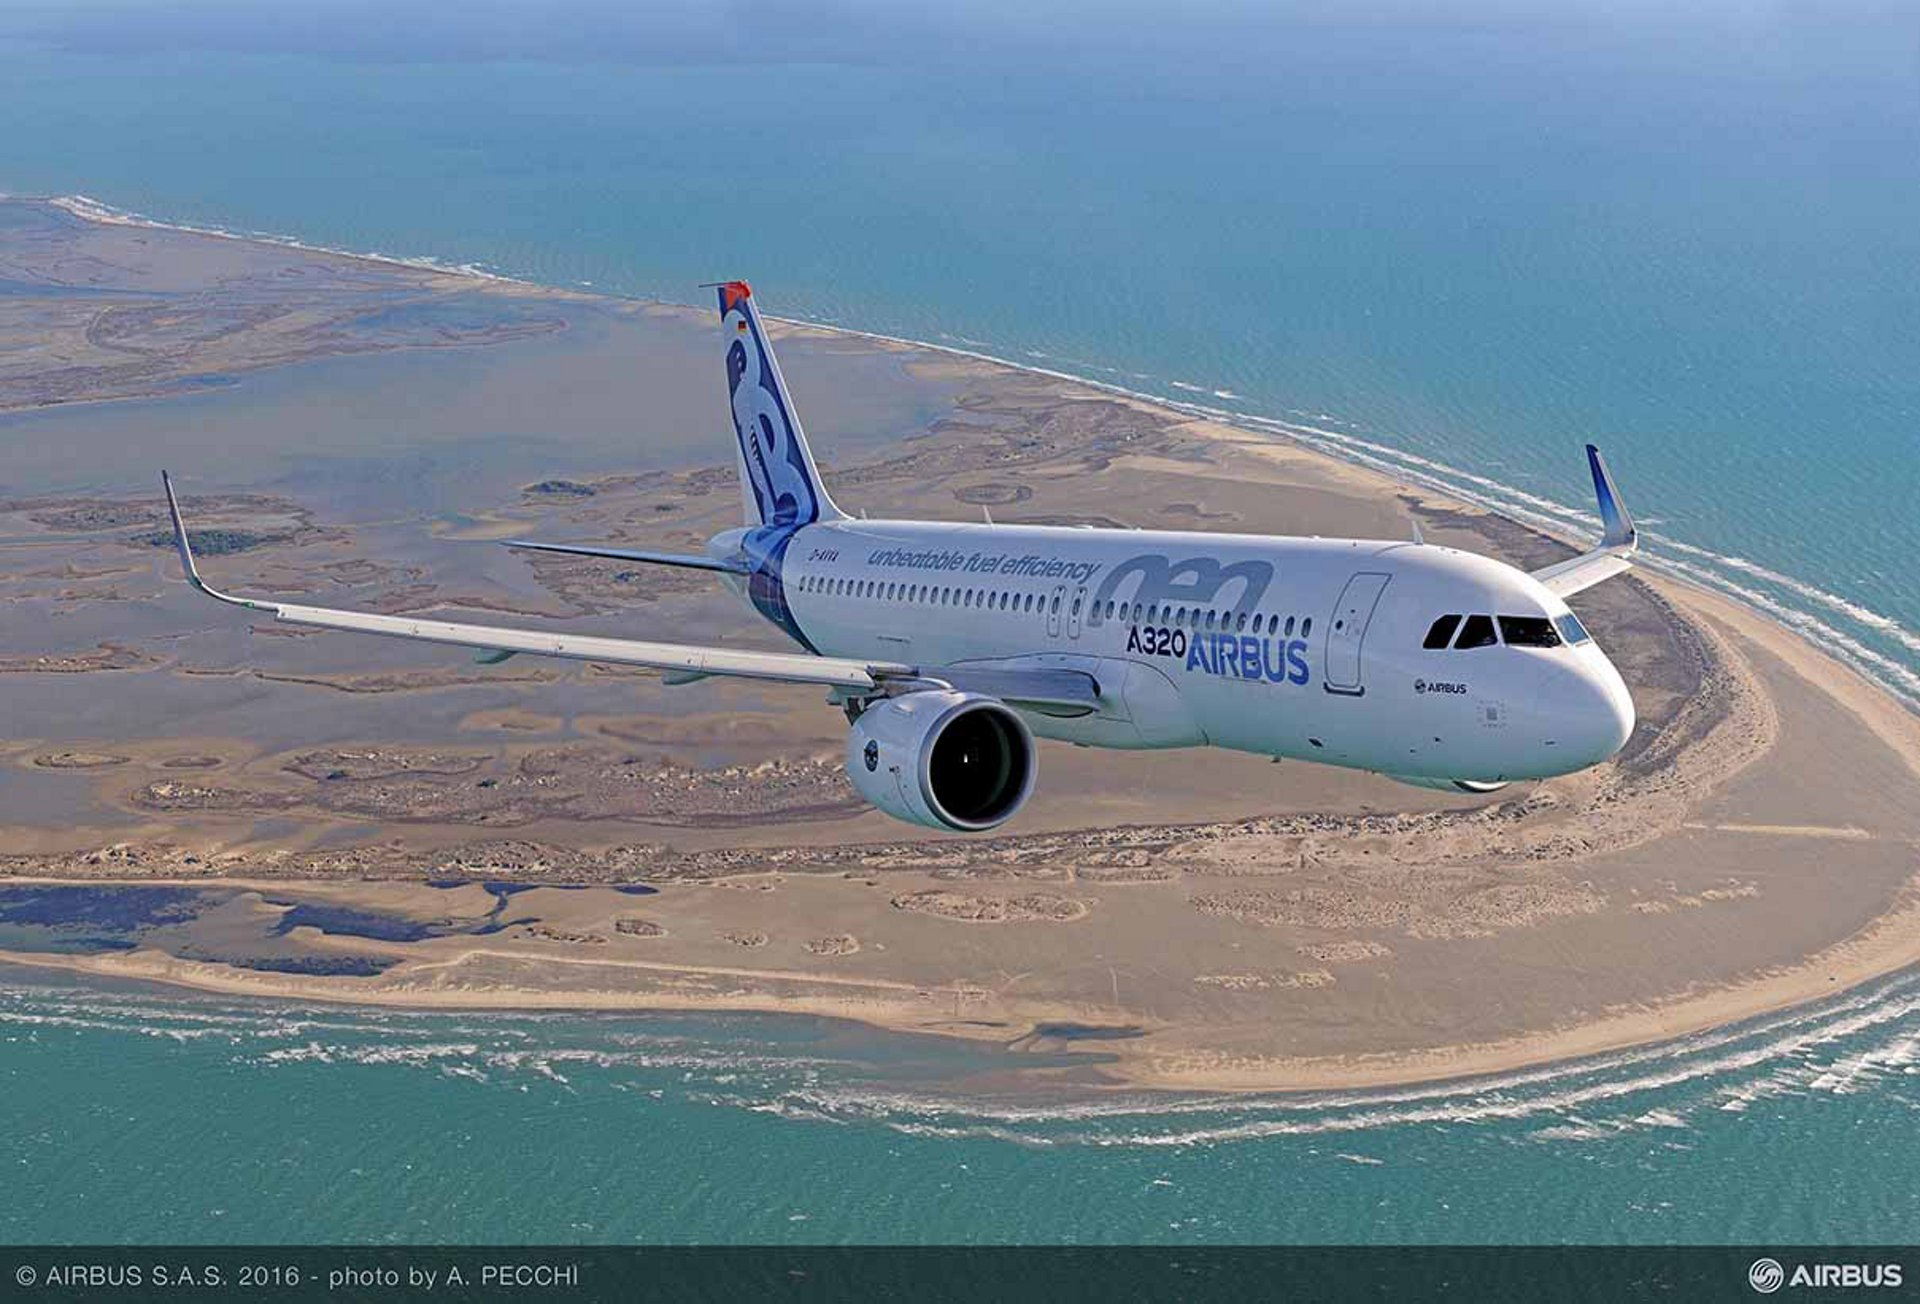 A320 Family - Passenger aircraft - Airbus